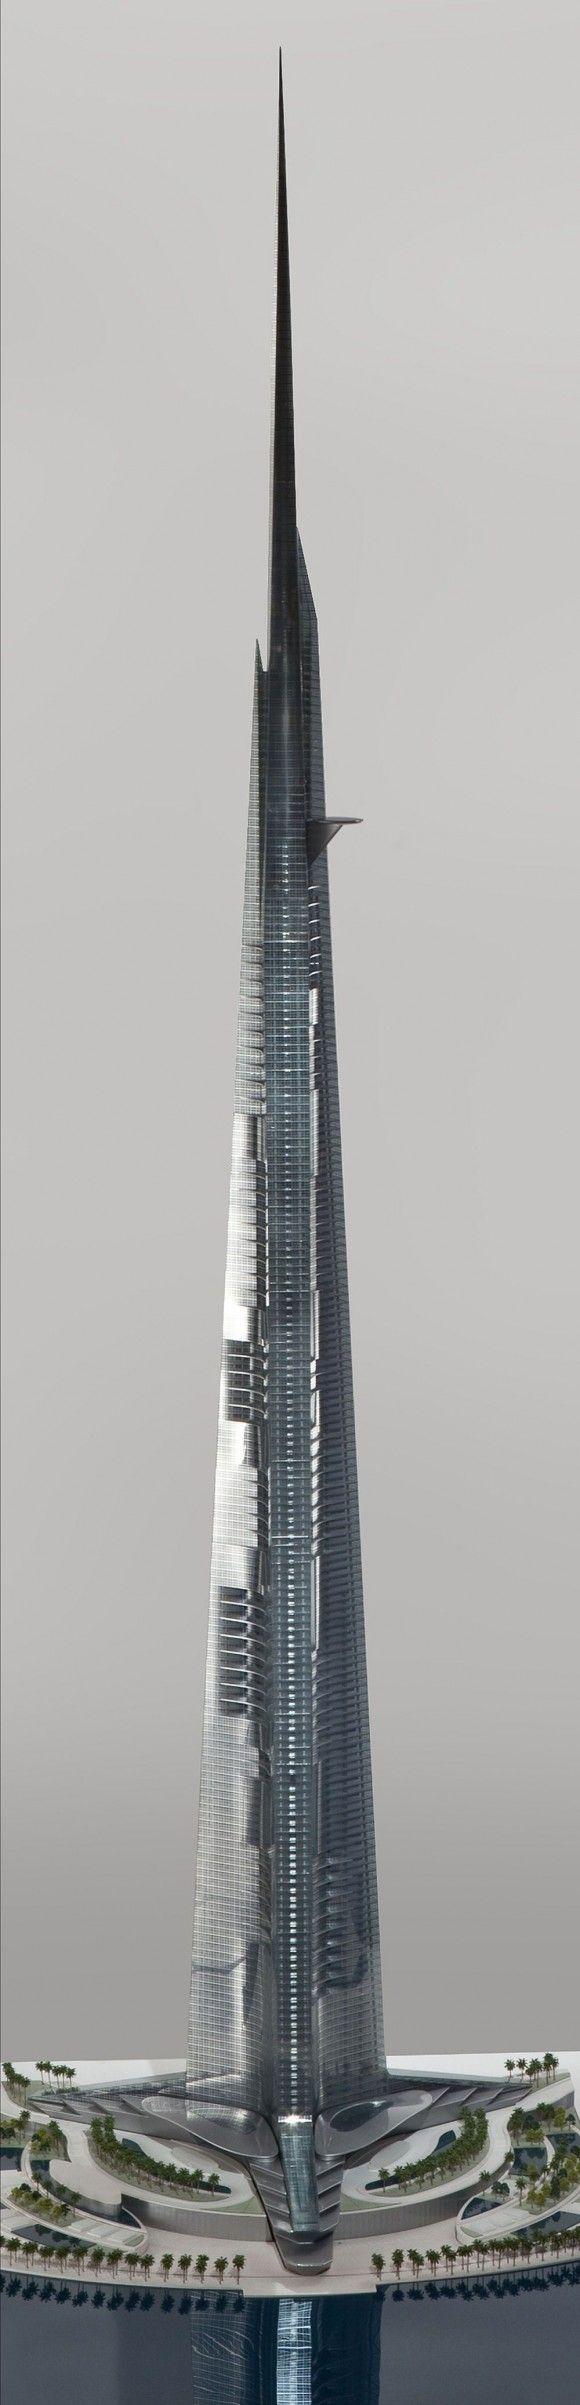 Burj al Mamlakah in Jeddah, Saudi Arabia, 1,000 m (idea).: Kingdom Torre, Architecture Magnificent, Architecture Highrise, Torre Model, 1000, Majestic Towers, Architectural Towers